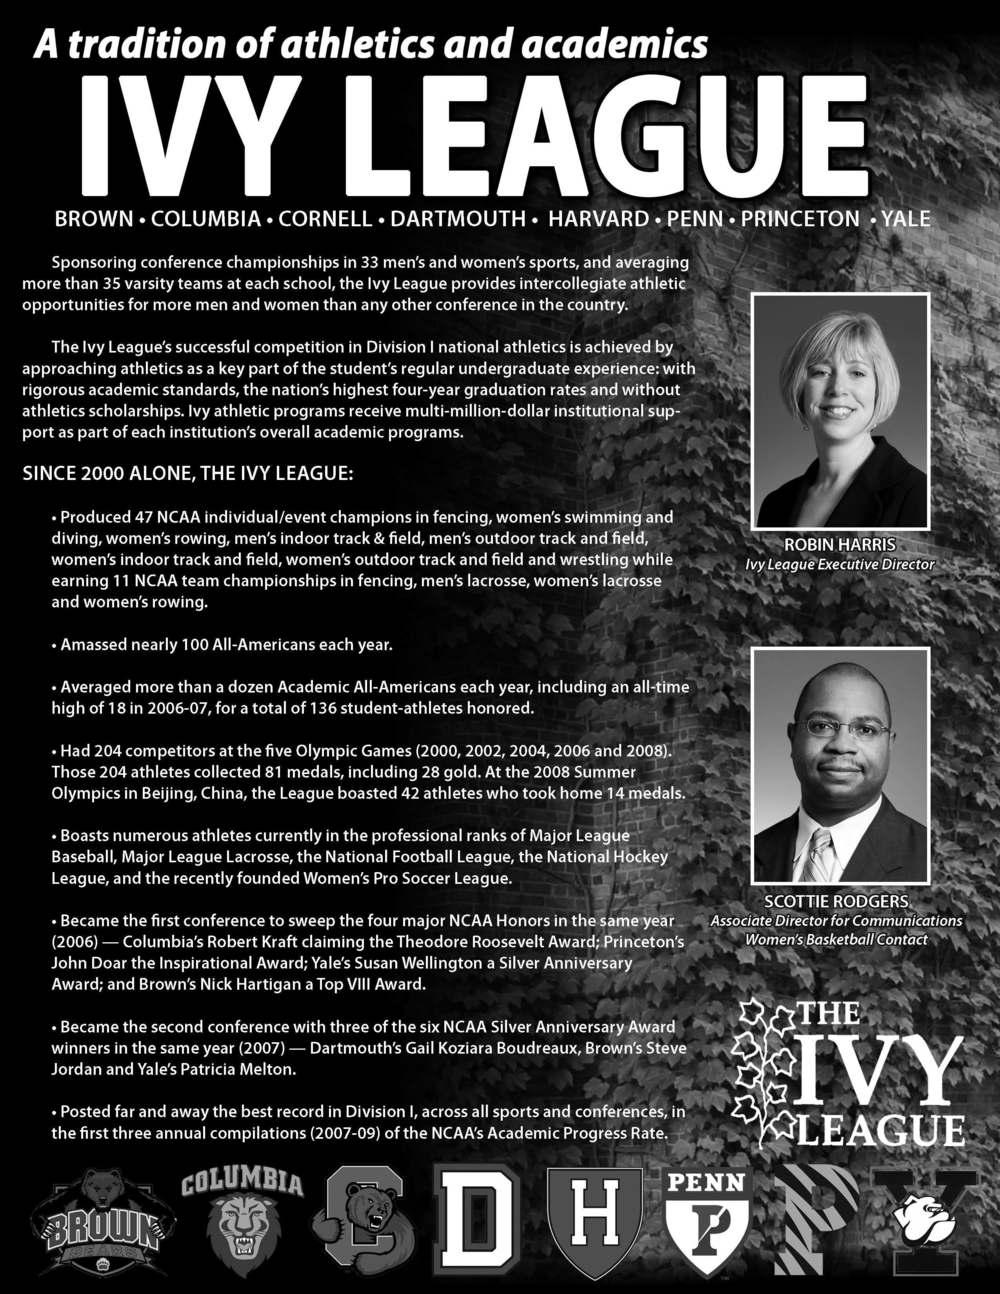 Ivy_League.jpg